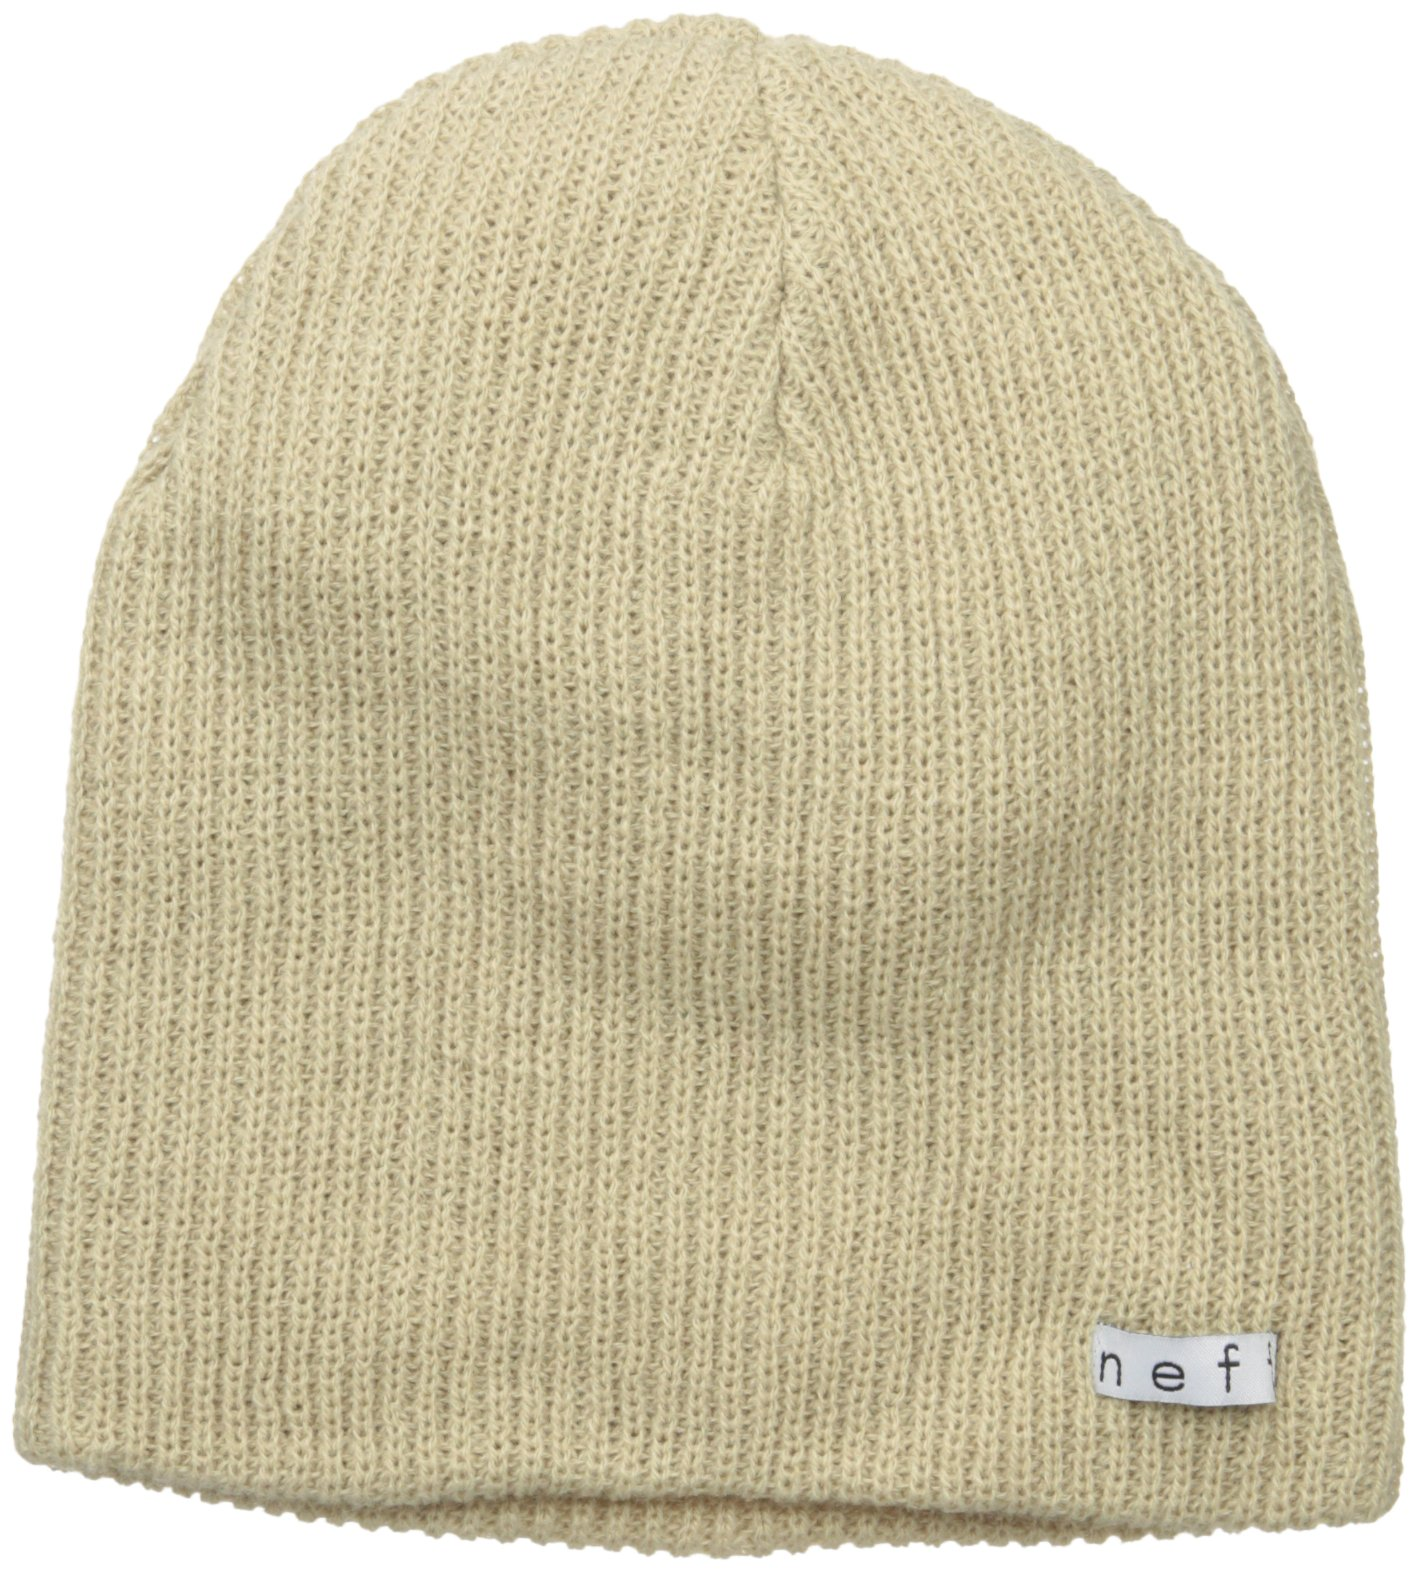 Neff Unisex Daily Beanie, Warm, Slouchy, Soft Headwear, twil